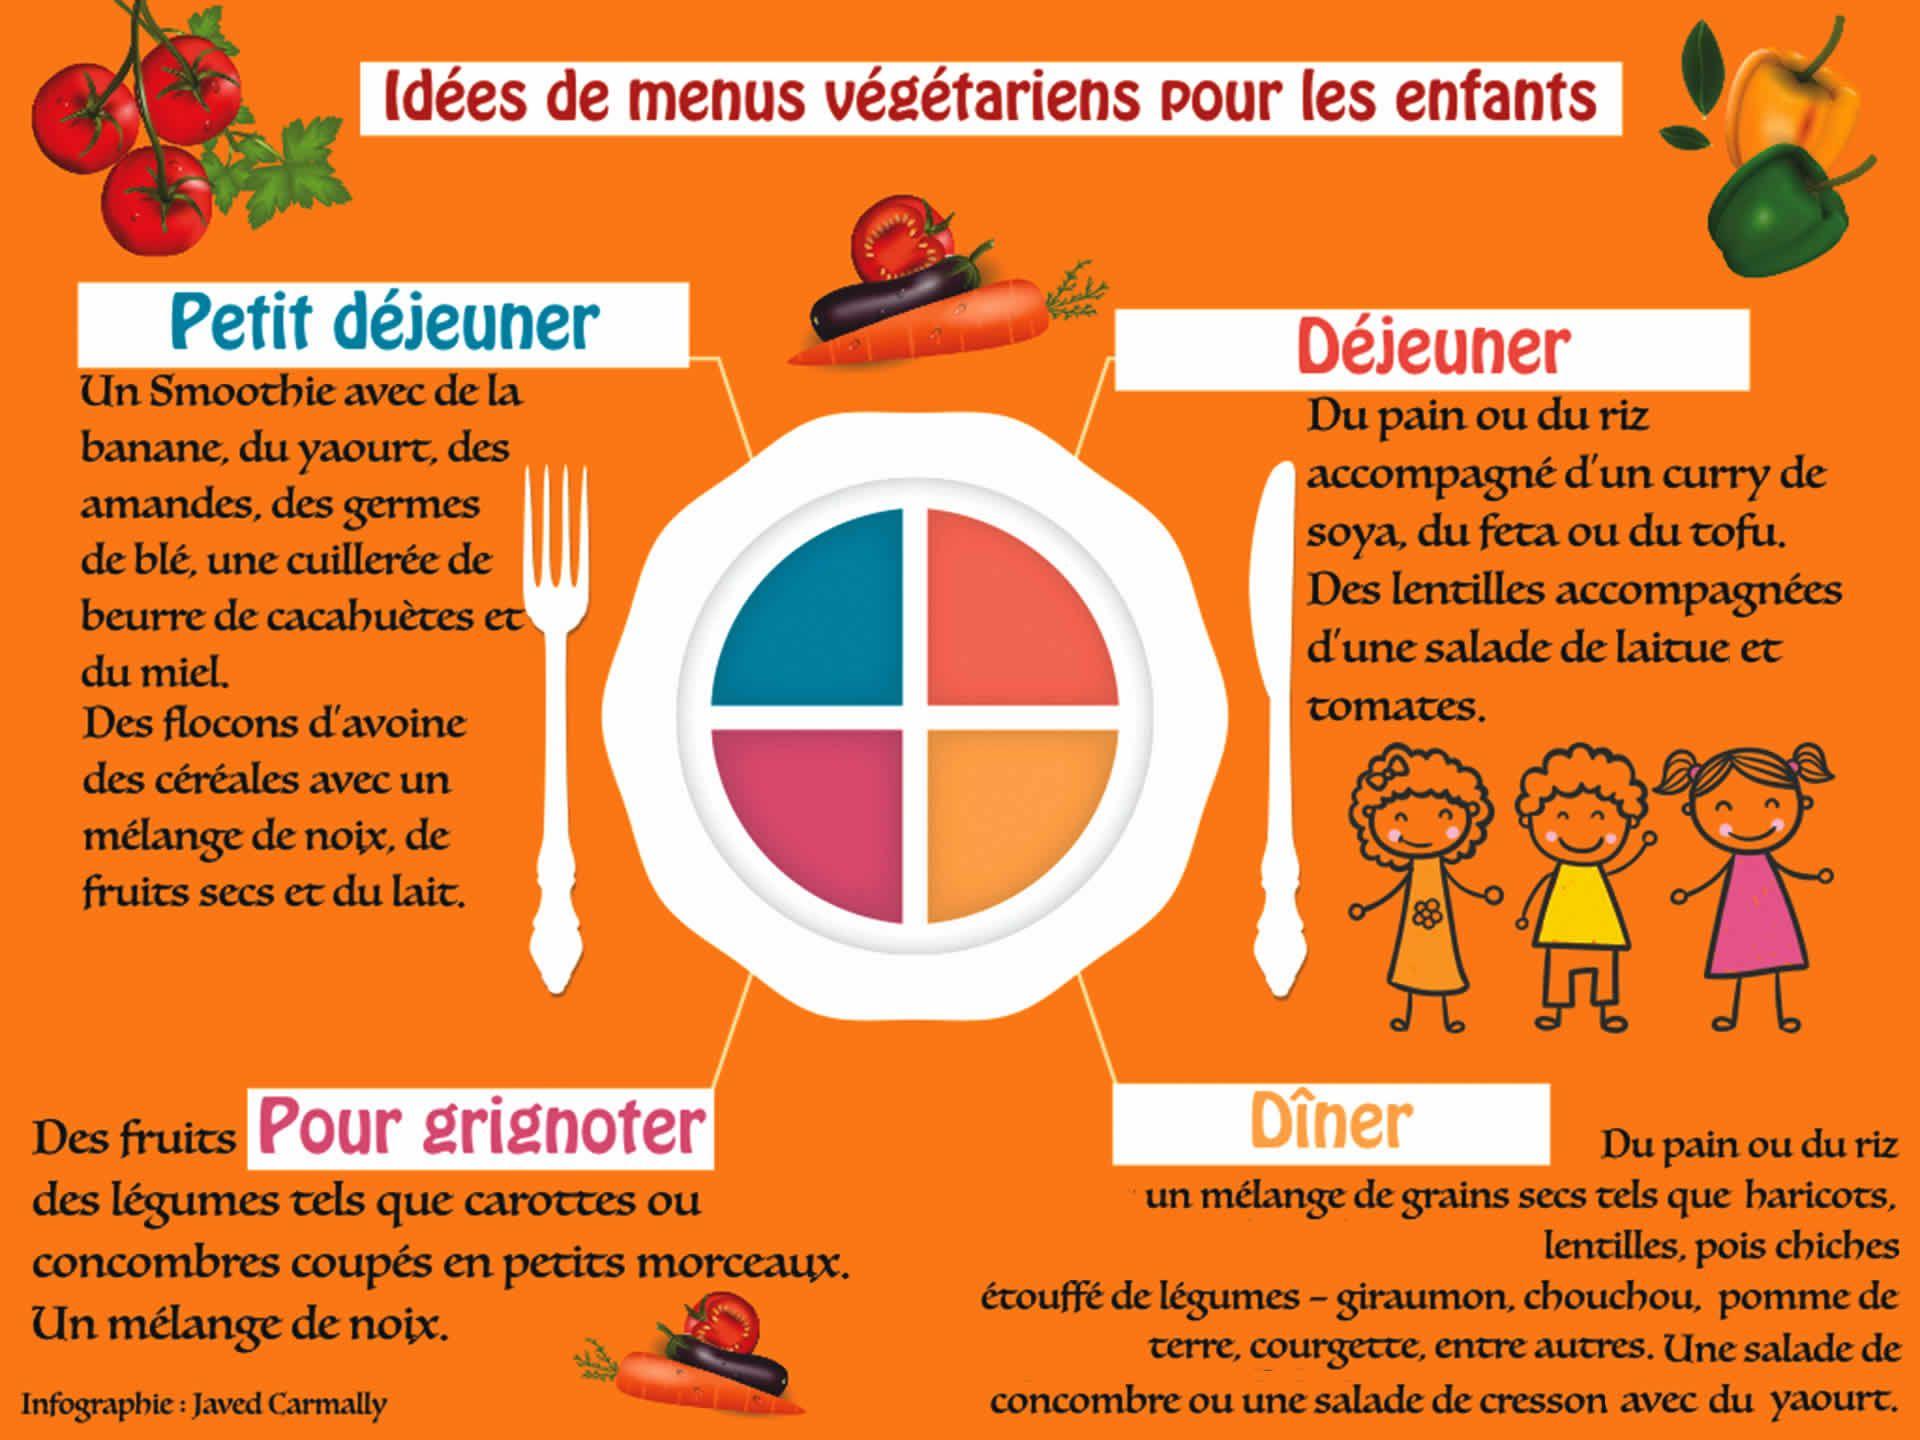 id es de menus v g tariens pour les enfants infographics. Black Bedroom Furniture Sets. Home Design Ideas